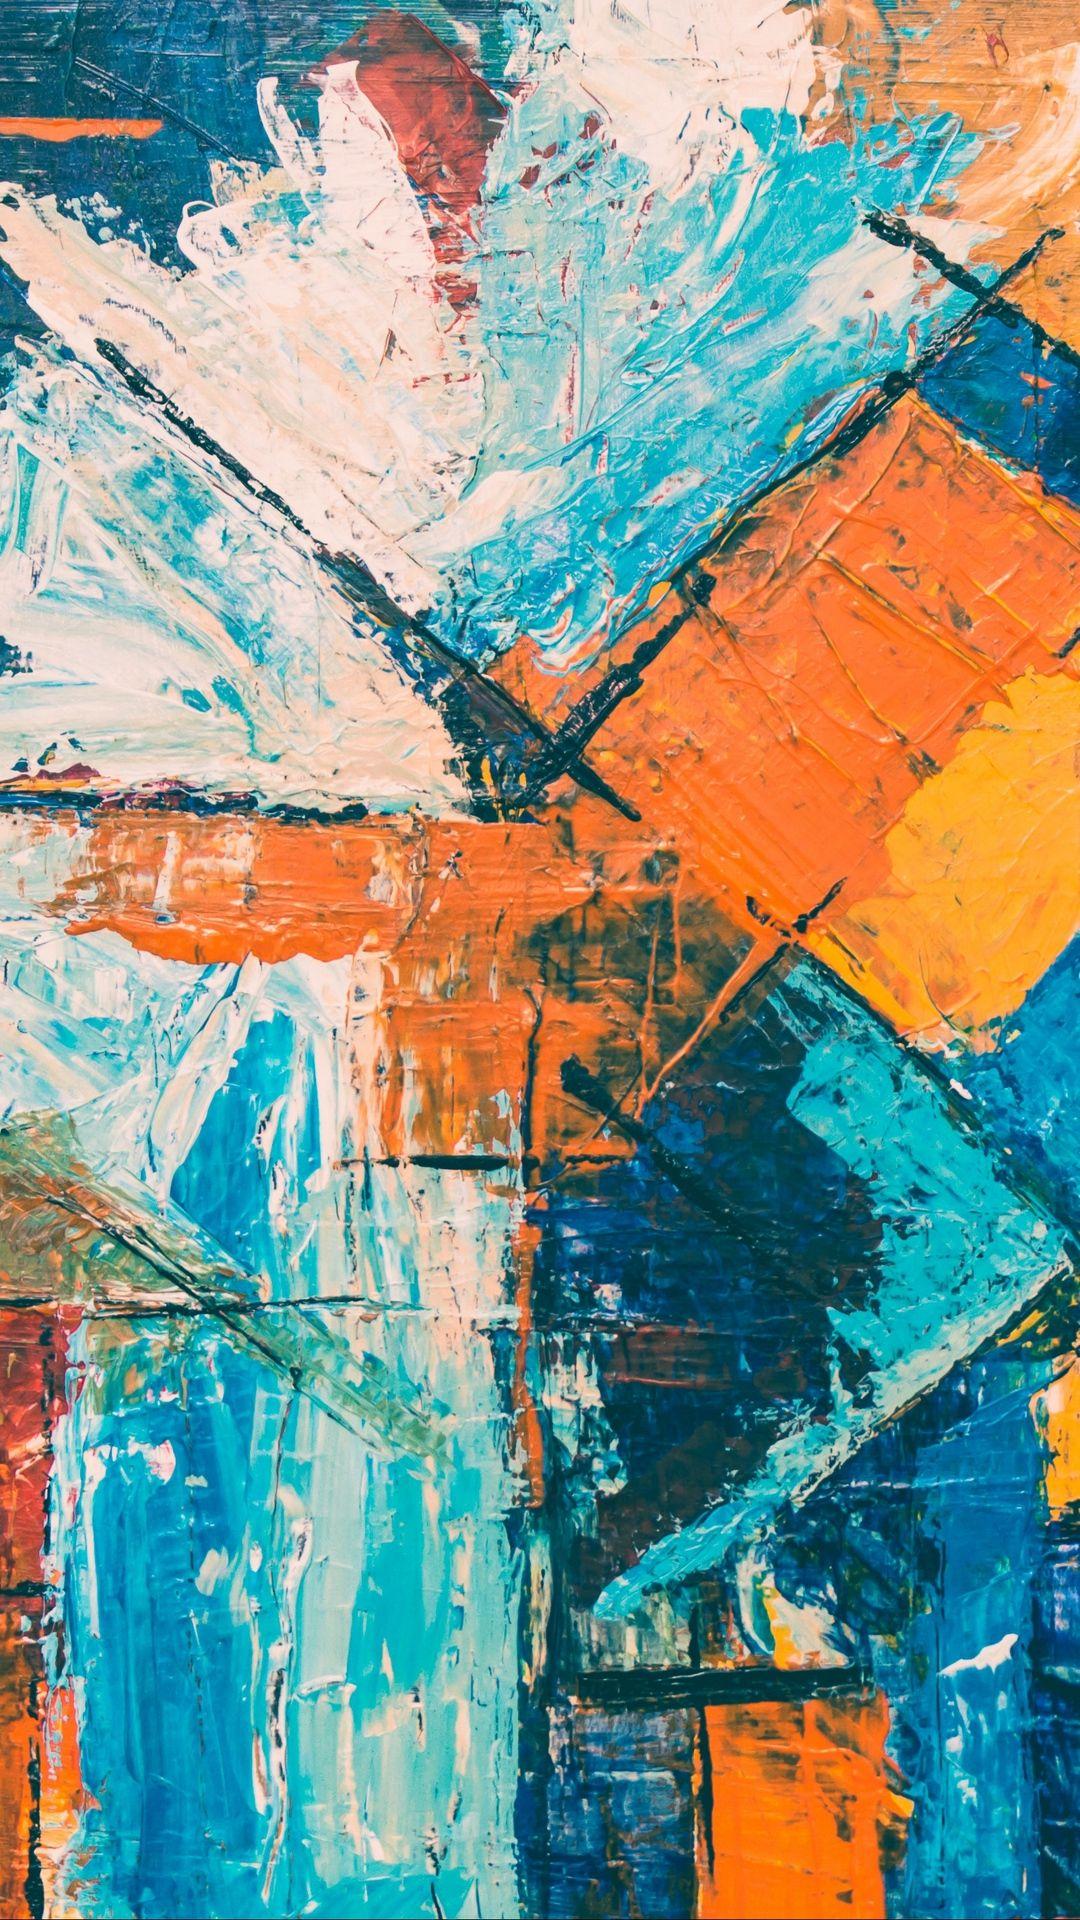 Splash Of Color Abstract Art Wallpaper Colorful Abstract Art Painting Wallpaper